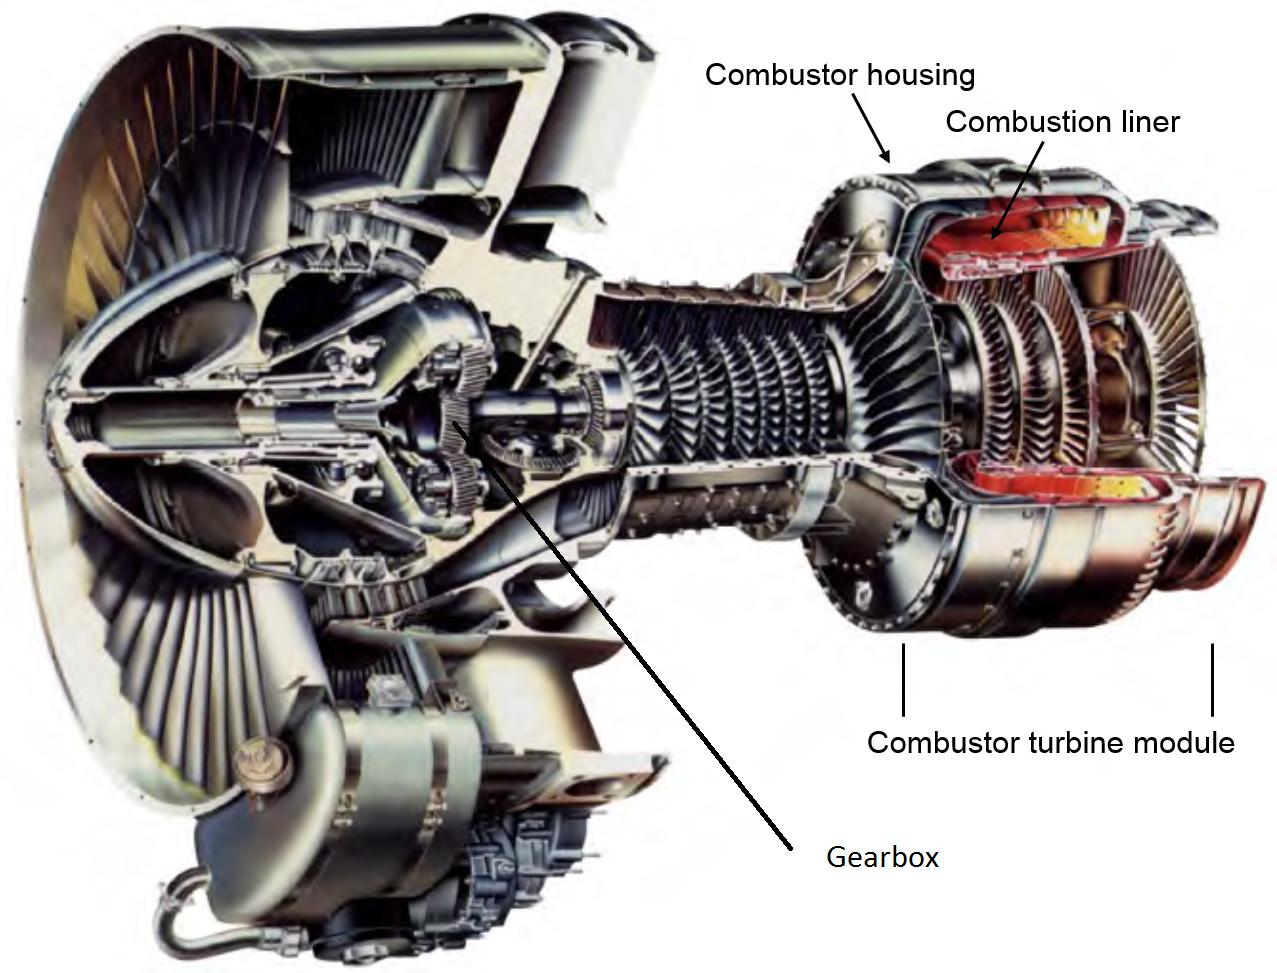 Bjorn's Corner: Geared turbofans - Leeham News and Analysis